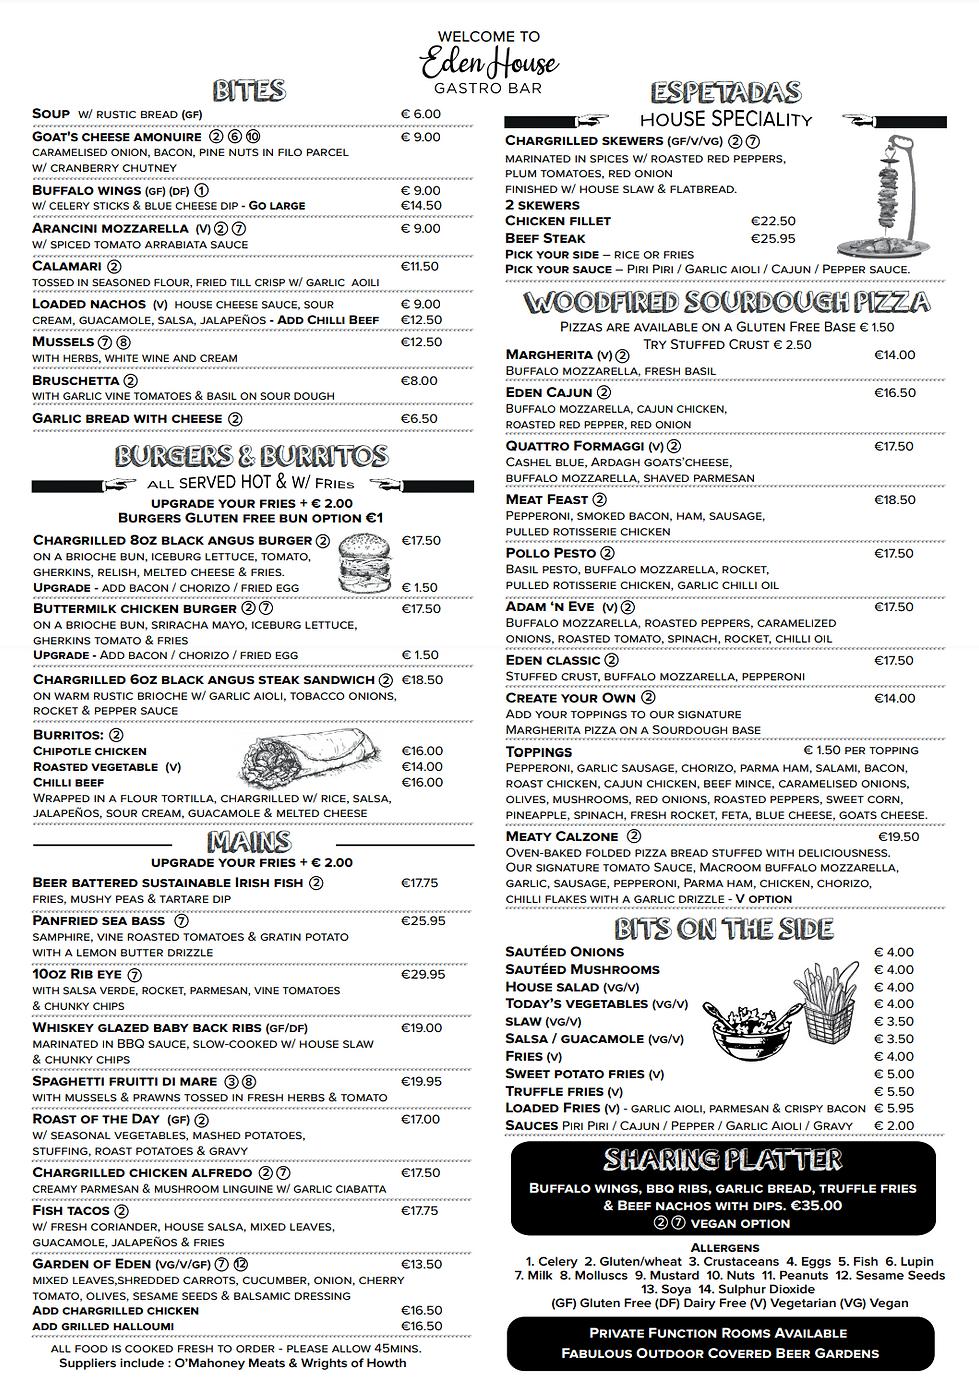 menu-side1a.png